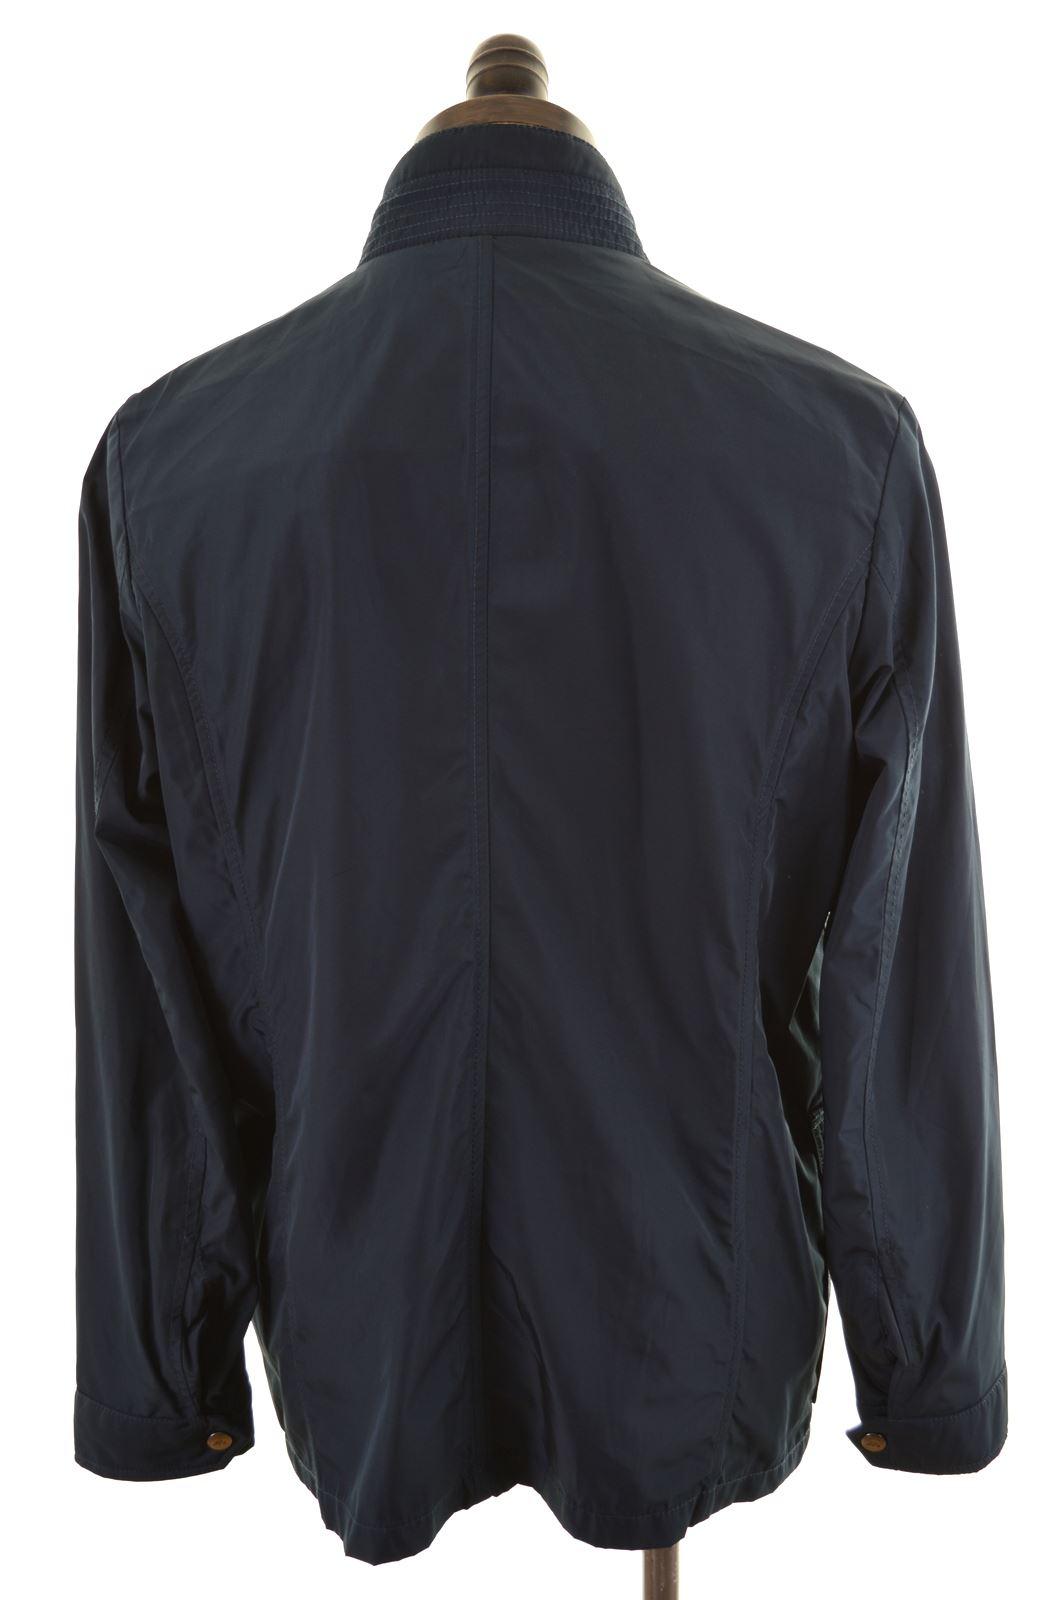 7f1483c8b Details about ELLESSE Mens Rain Jacket Size 38 Medium Navy Blue Polyester  DR24